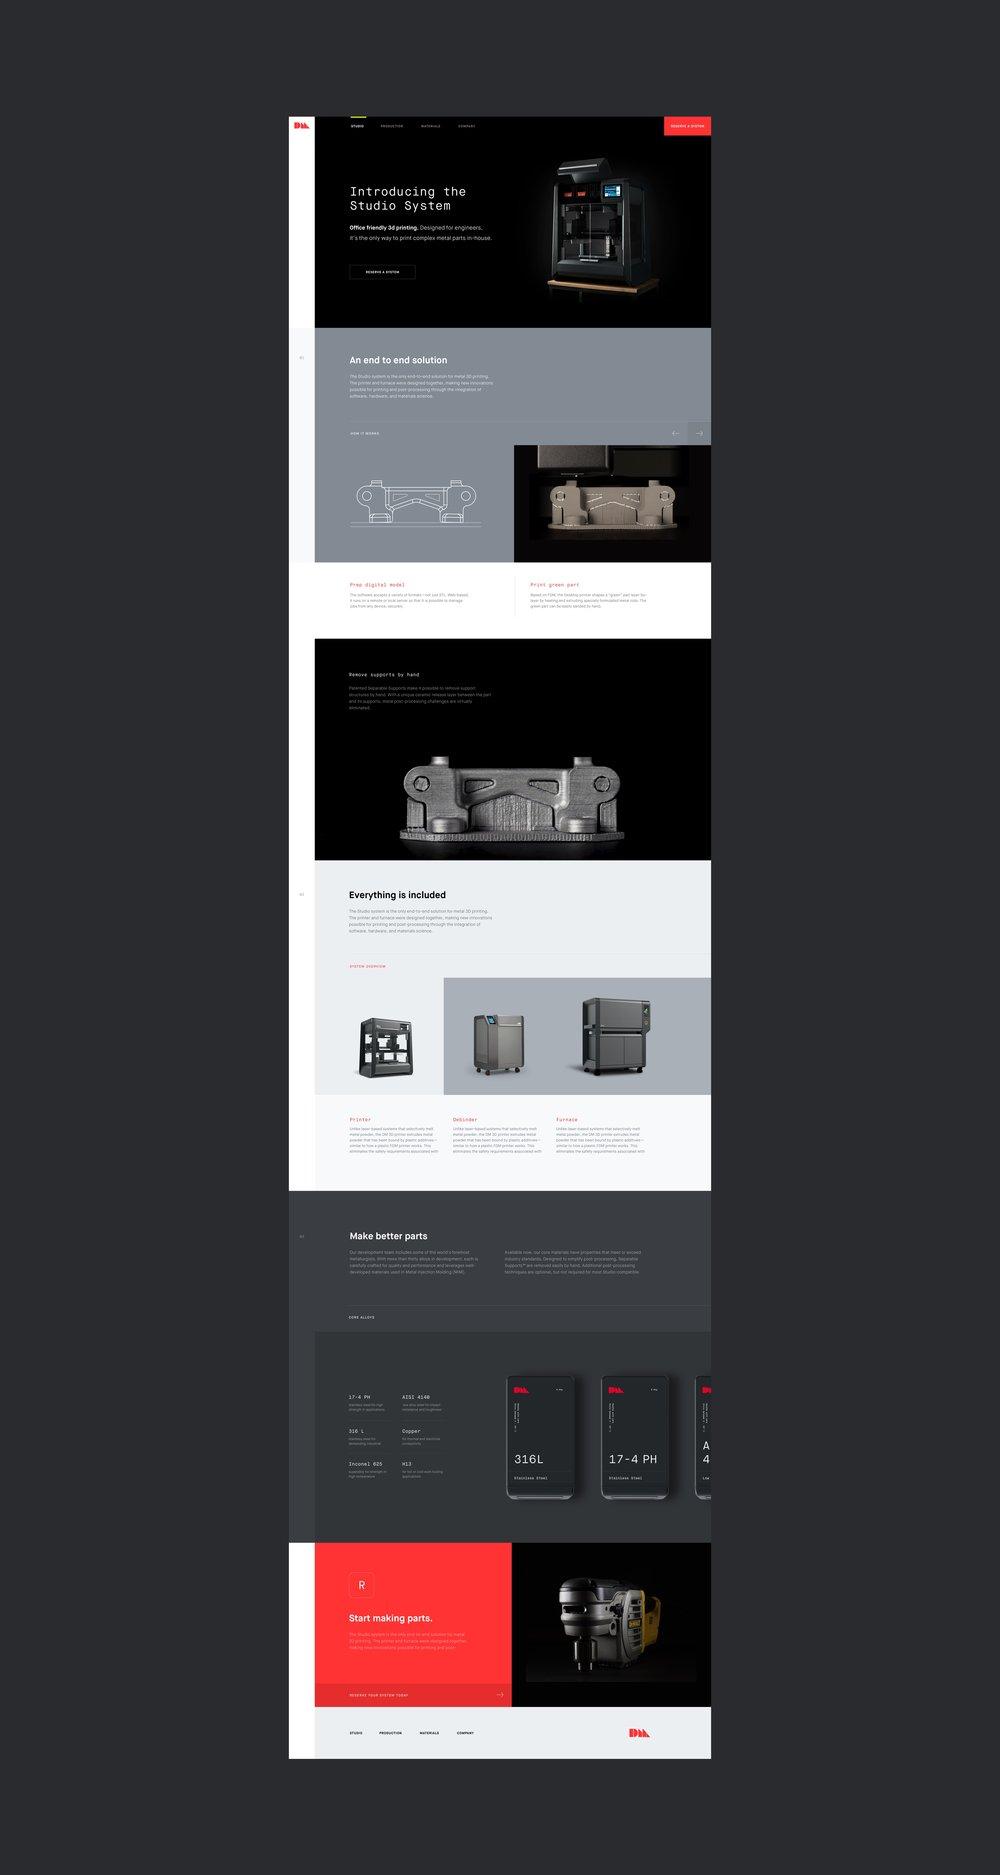 website-1@2x.jpg